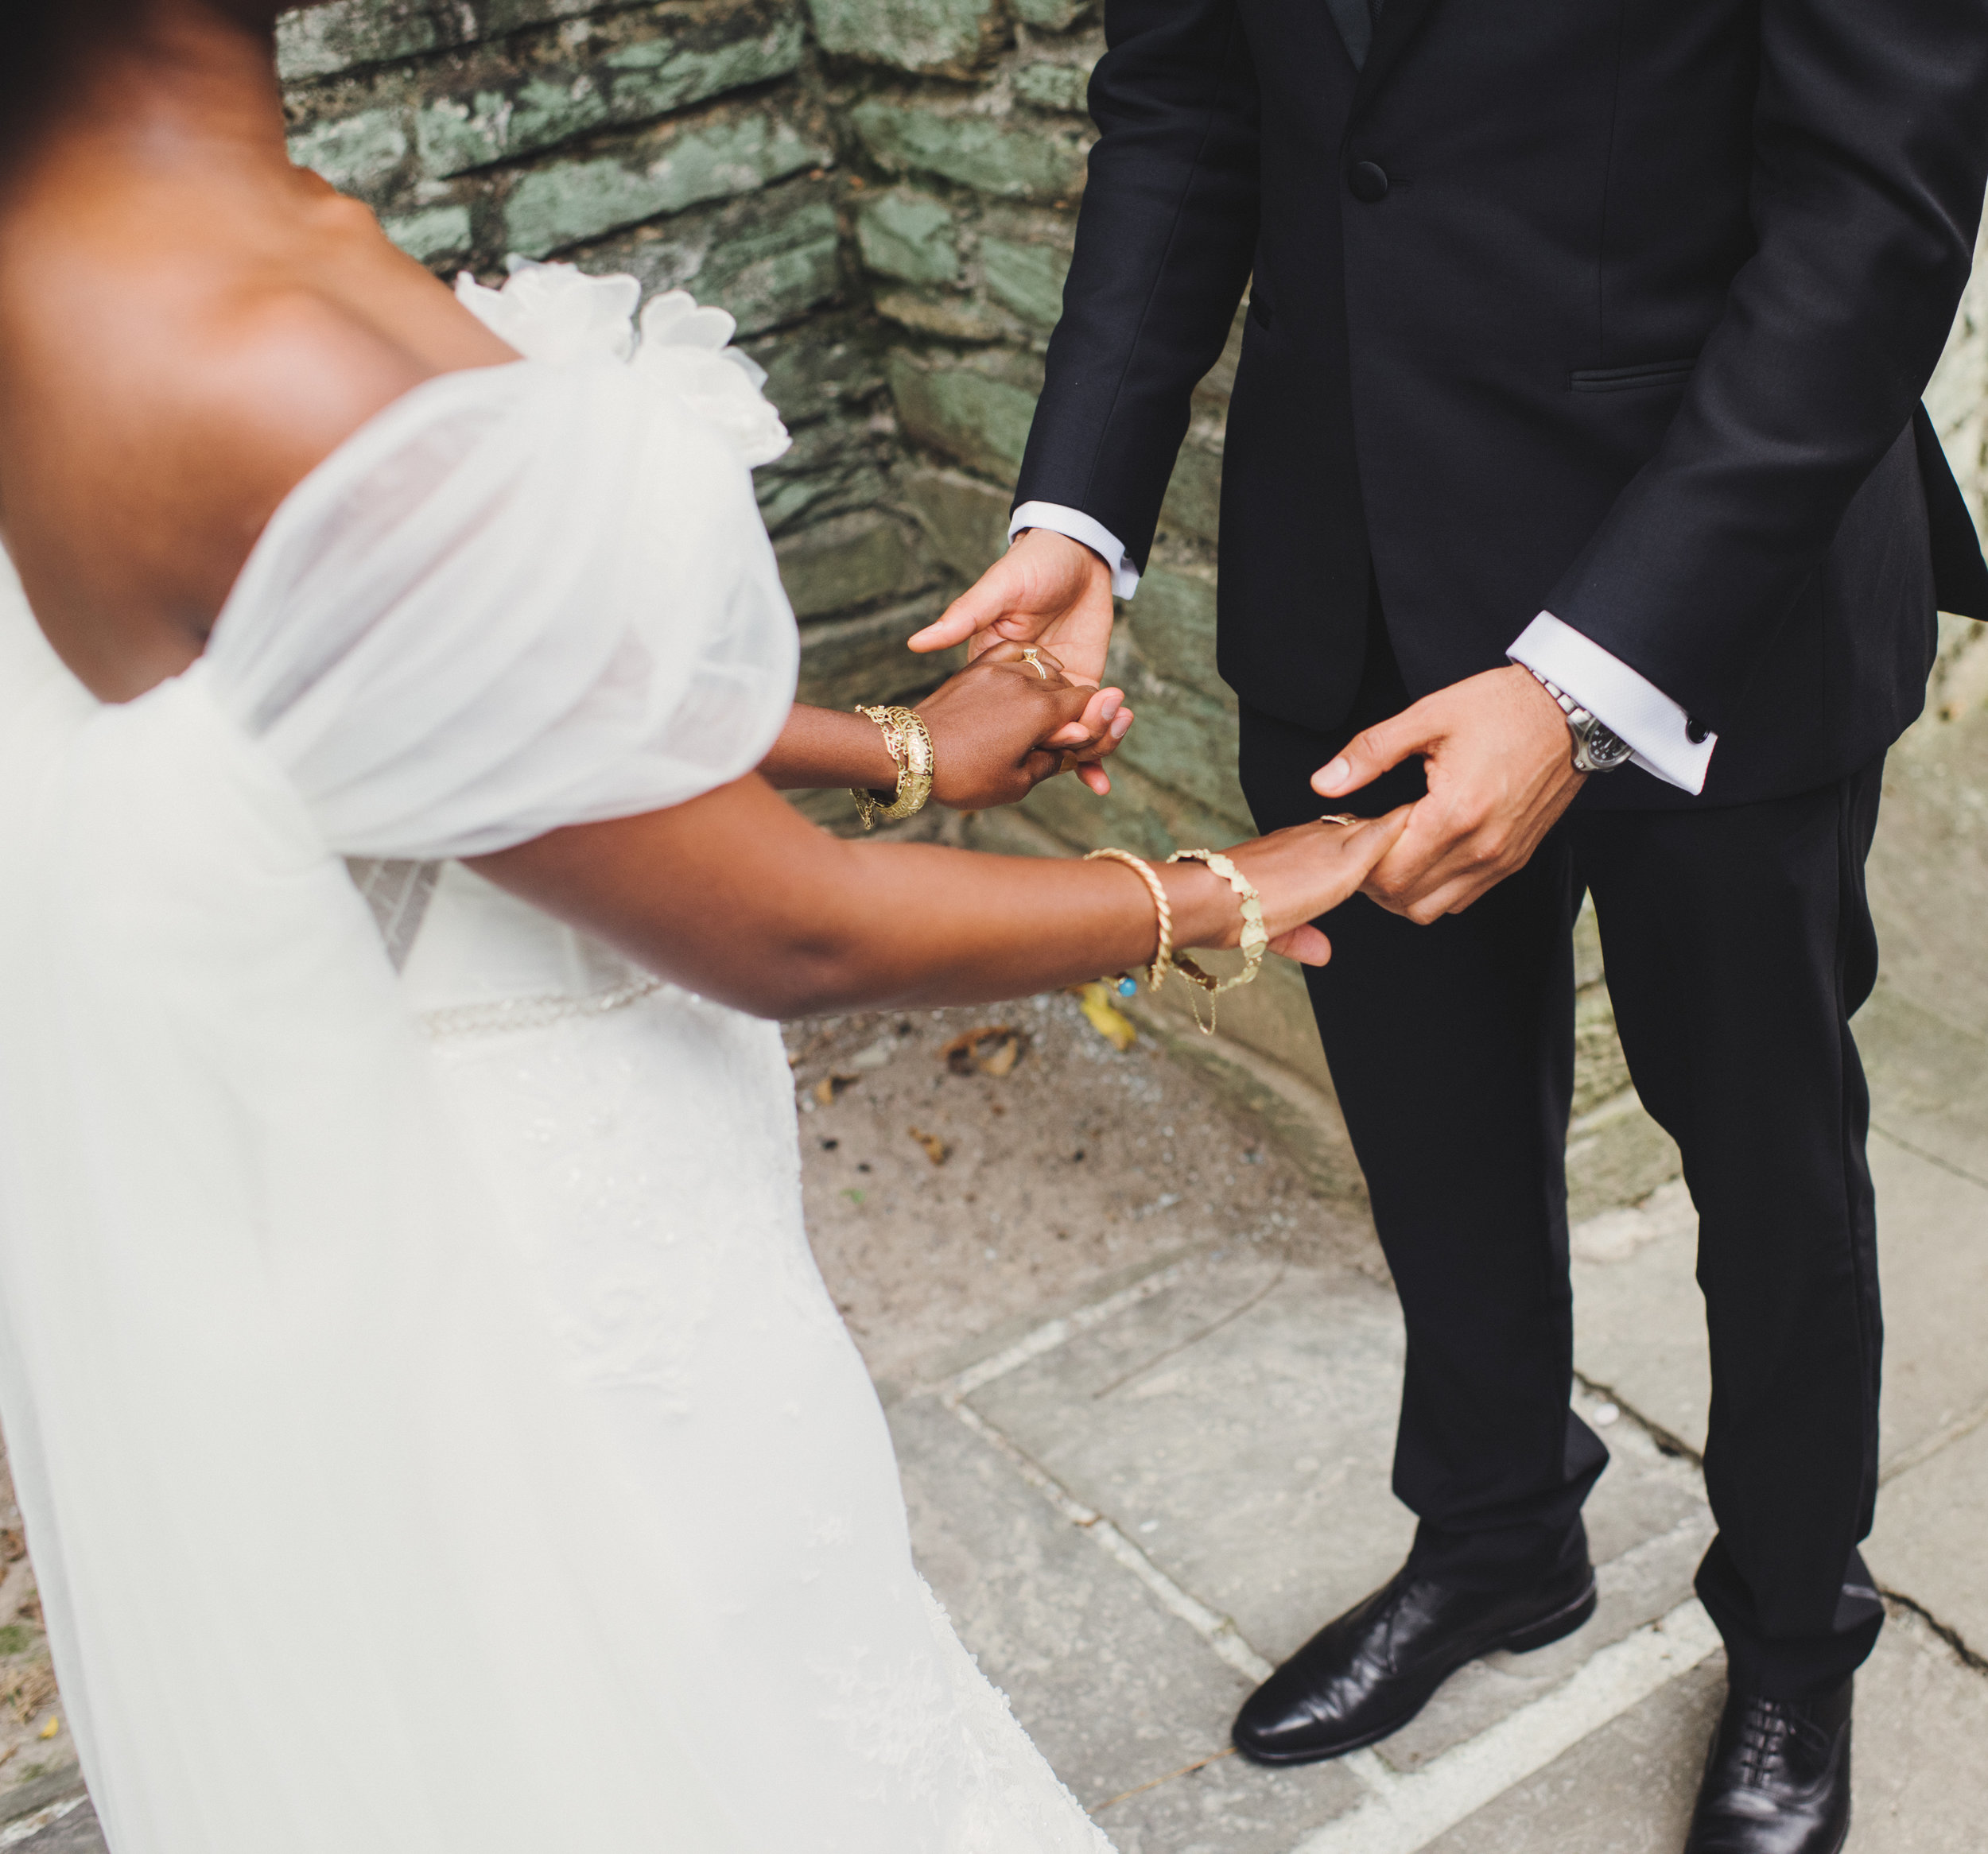 GLENVIEW MANSION WEDDING - INTIMATE WEDDING PHOTOGRAPHER - TWOTWENTY by CHI-CHI AGBIM-139.jpg